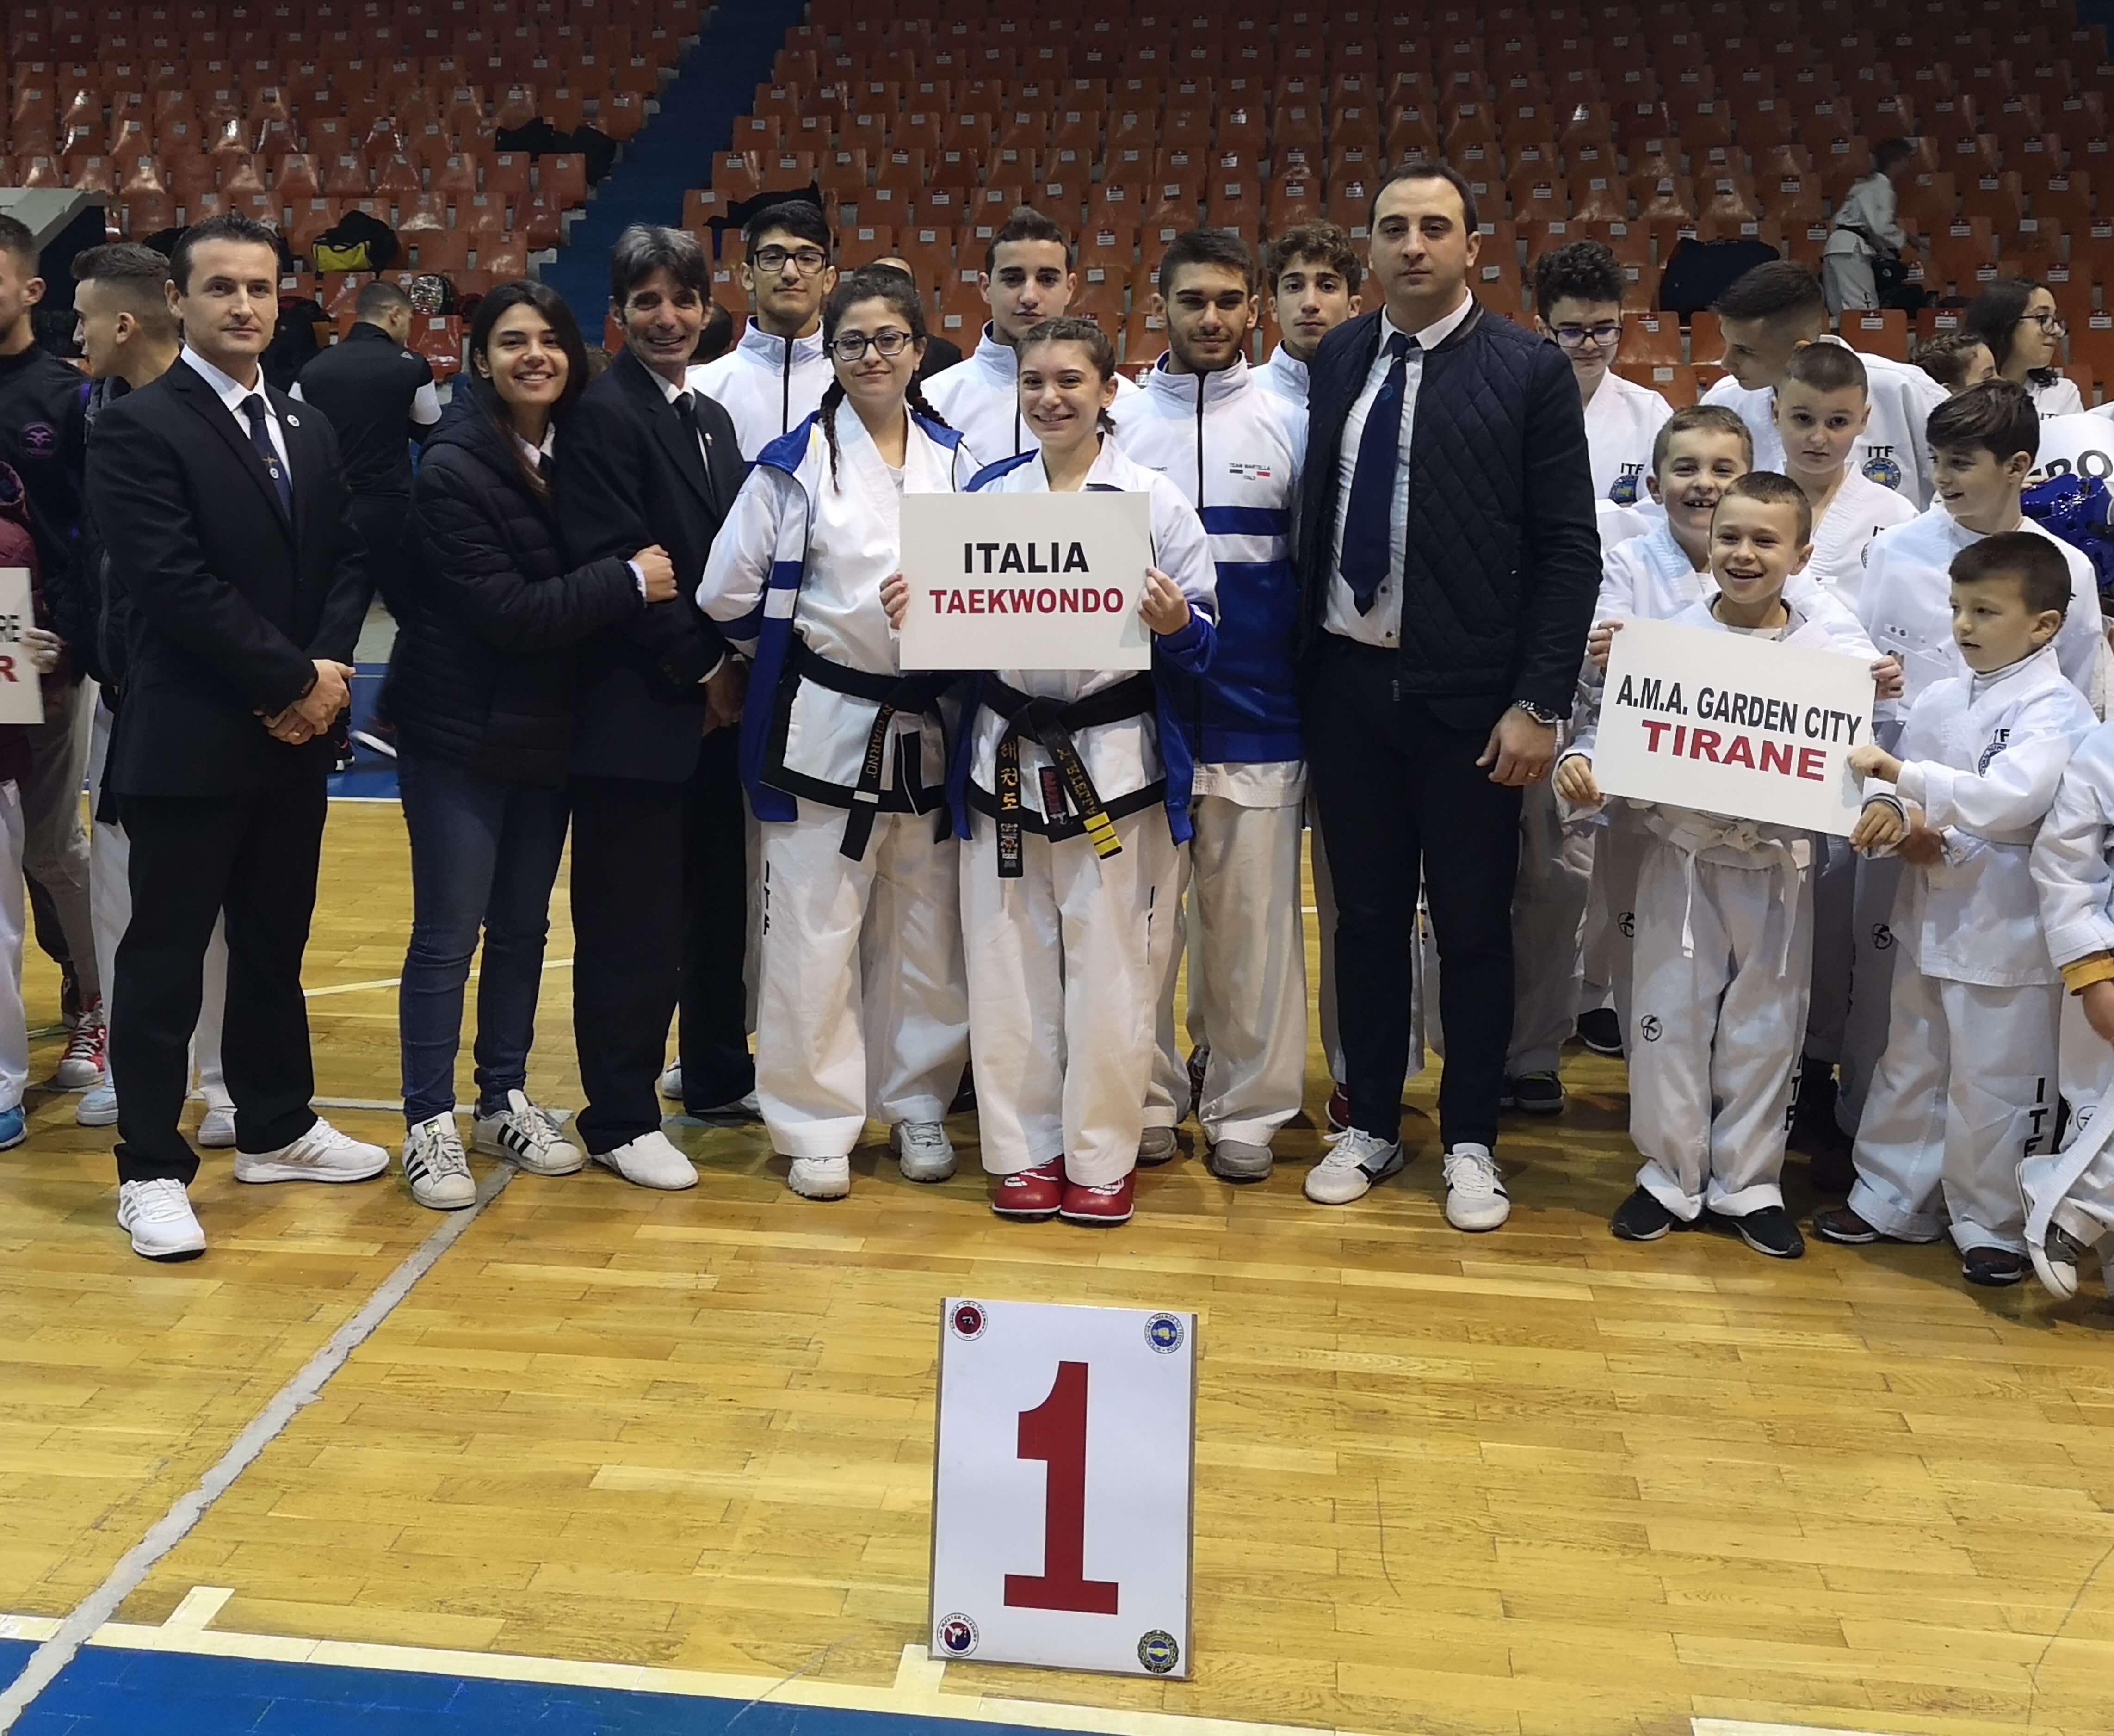 Albanian Open Taekwon-Do Championship 2018